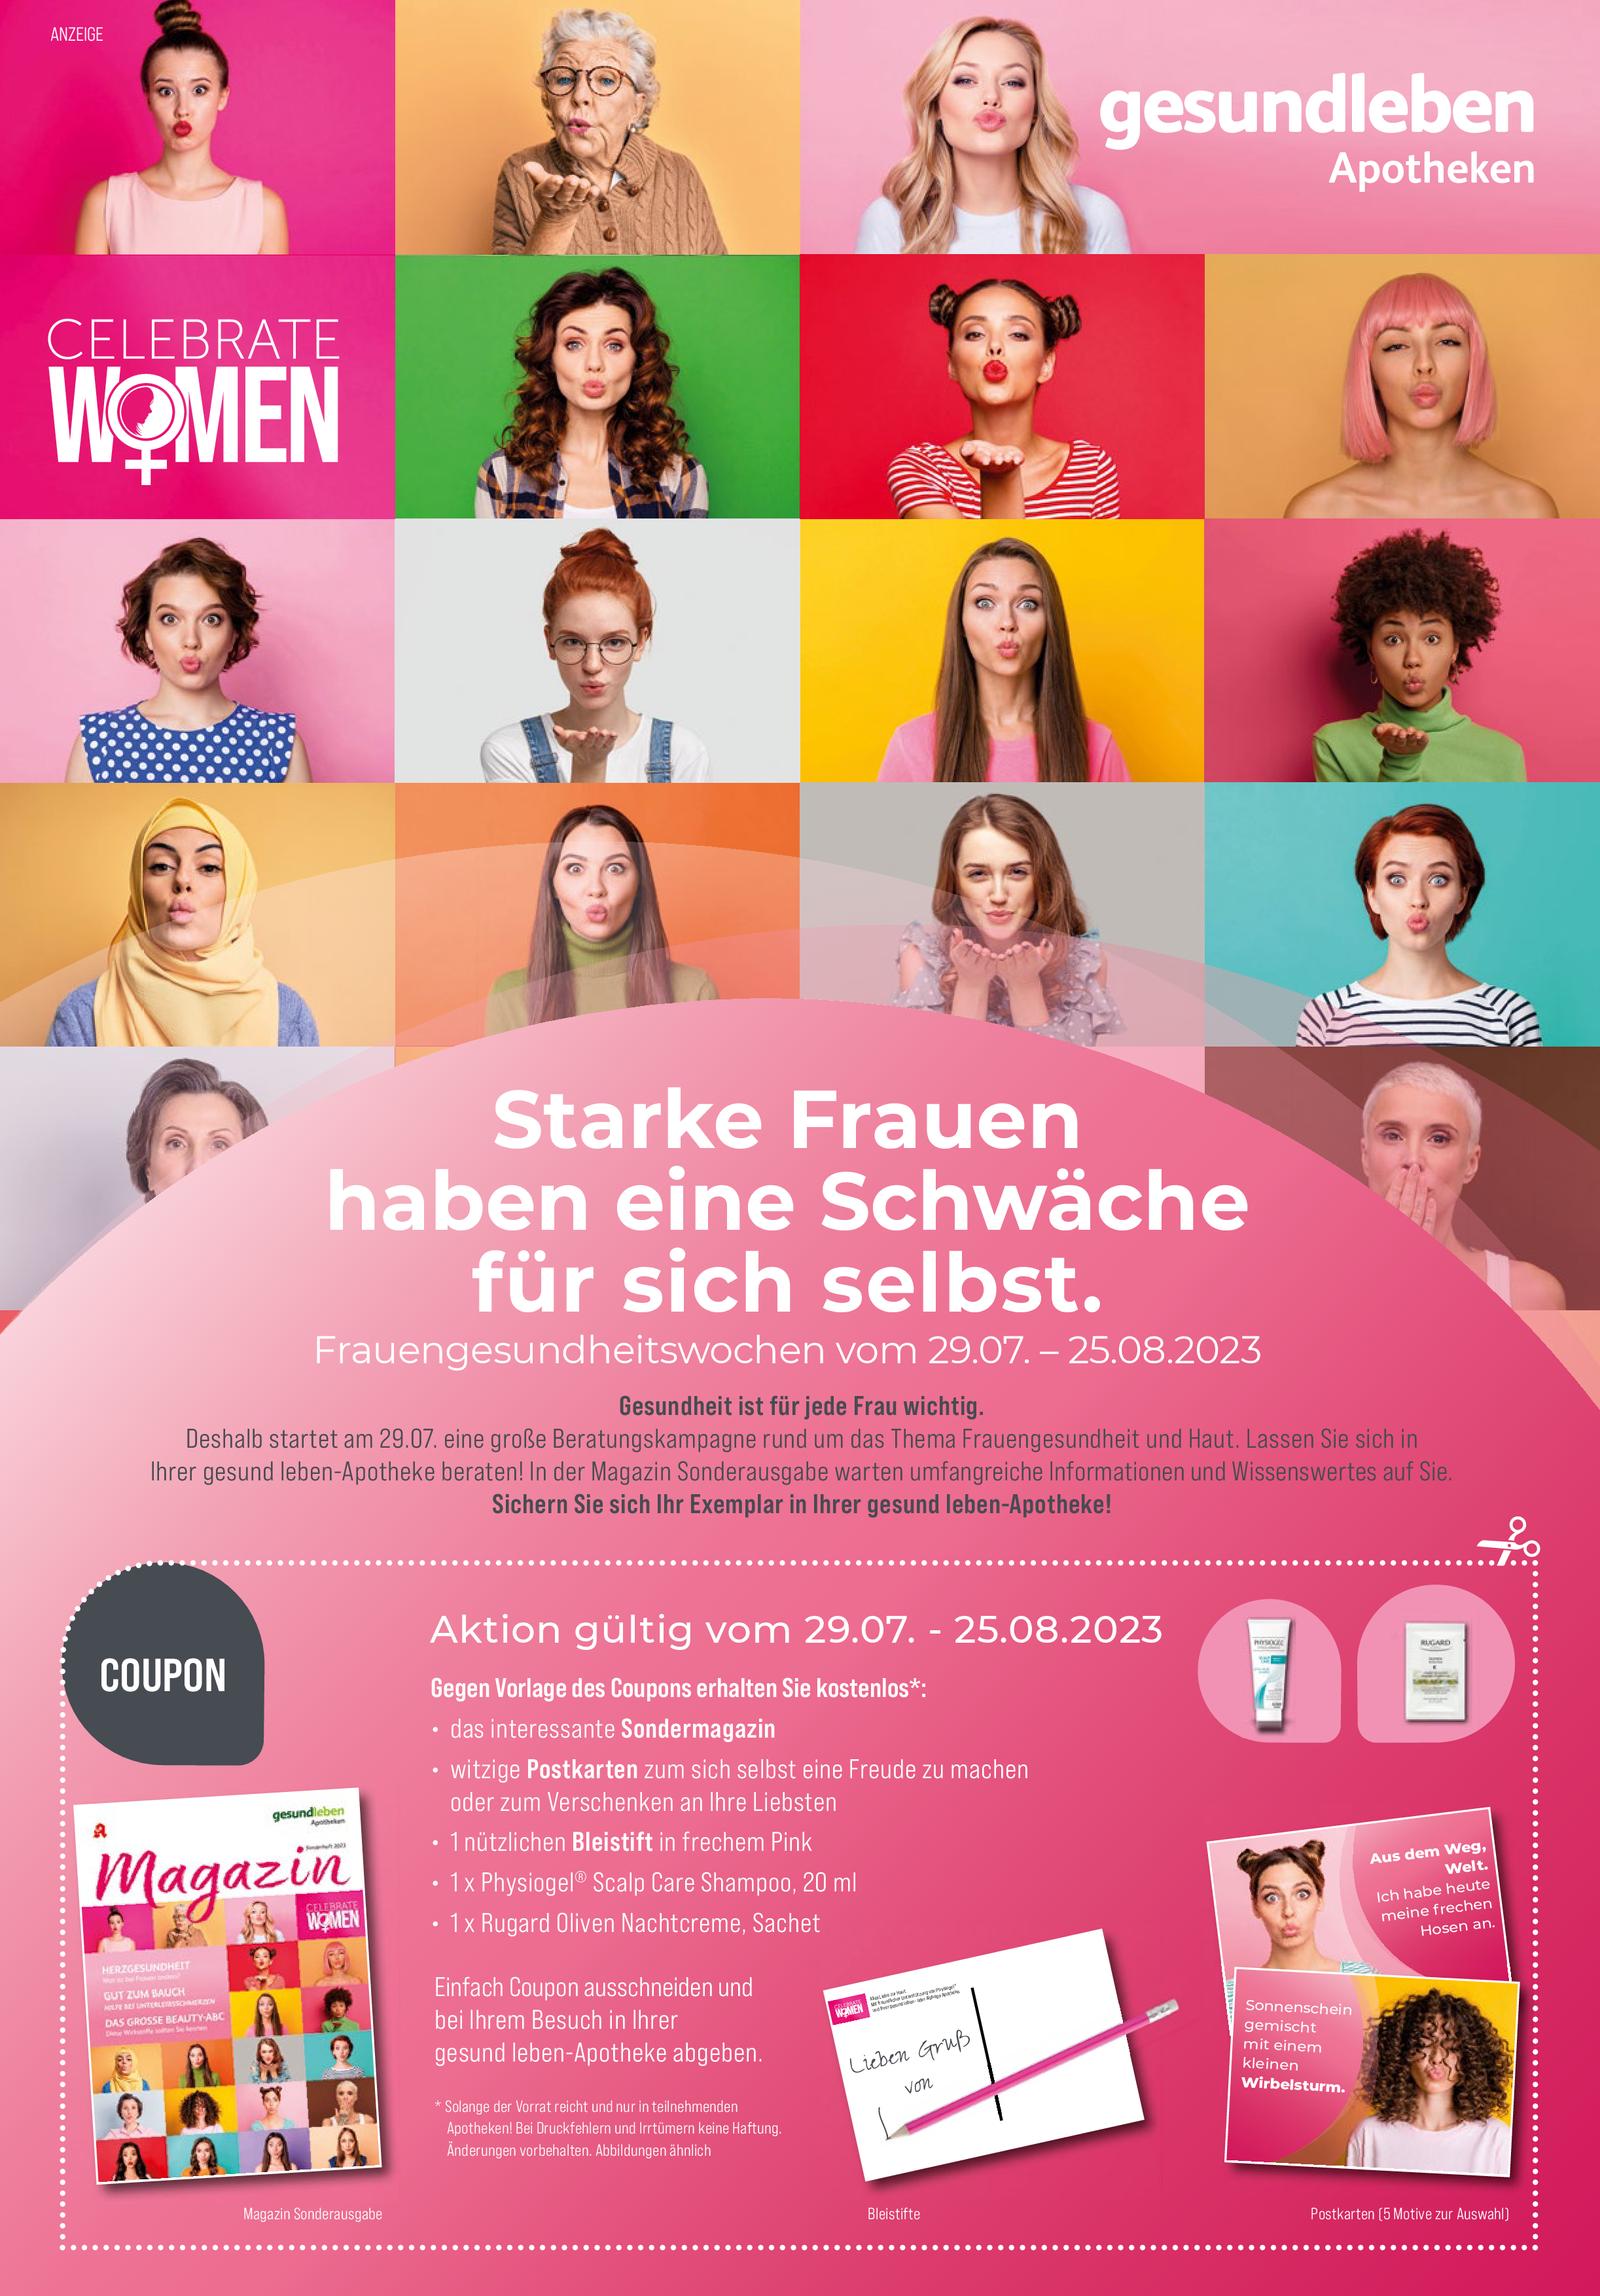 https://mein-uploads.apocdn.net/15933/leaflets/gesundleben_niedrig-Seite5.png